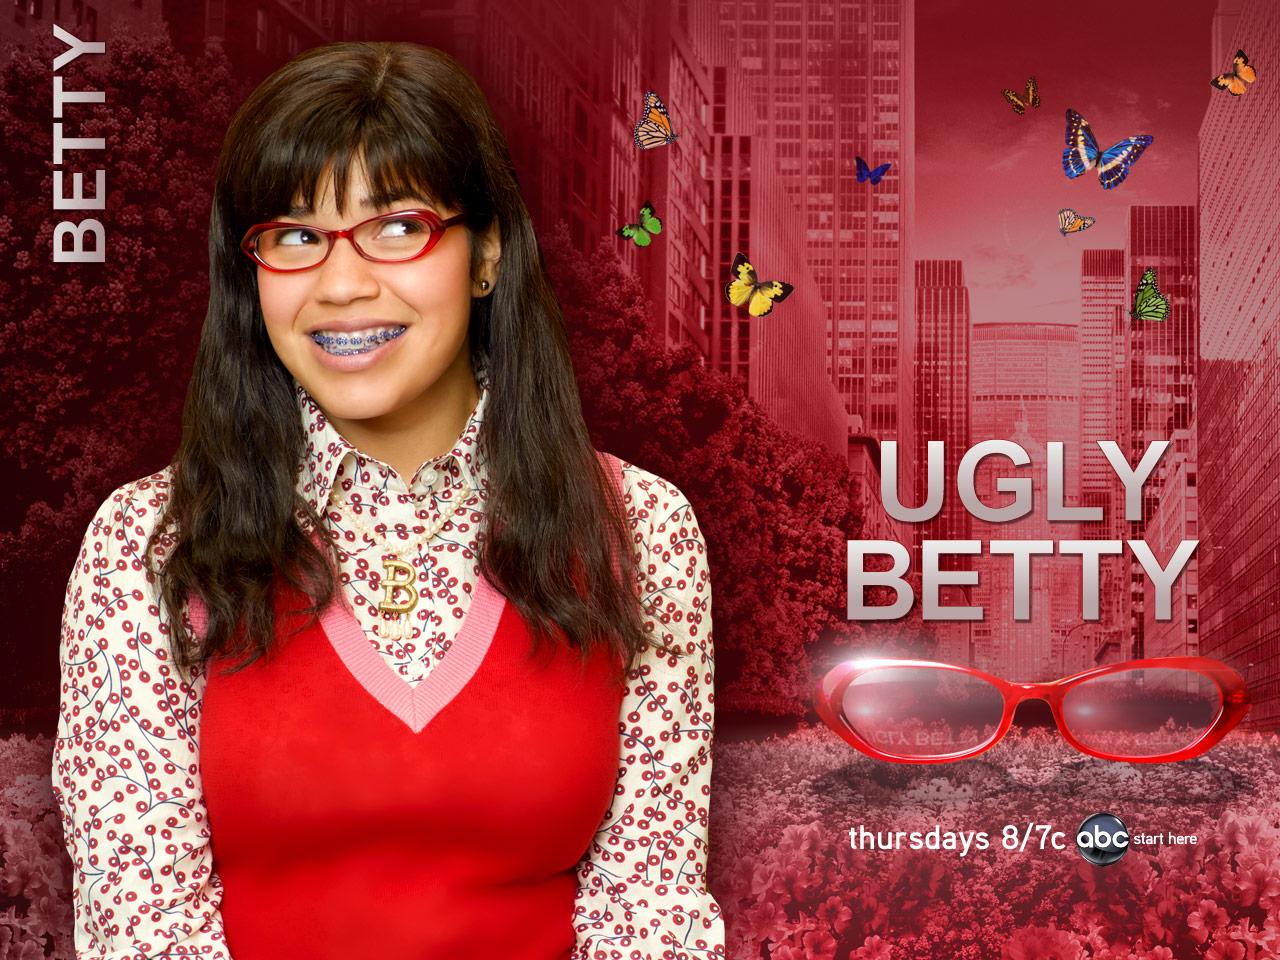 http://2.bp.blogspot.com/-QJDMBmIngqs/UNJX62UBQ1I/AAAAAAAAJYw/_eJ4N6G-aa4/s1600/UglyBetty.jpg